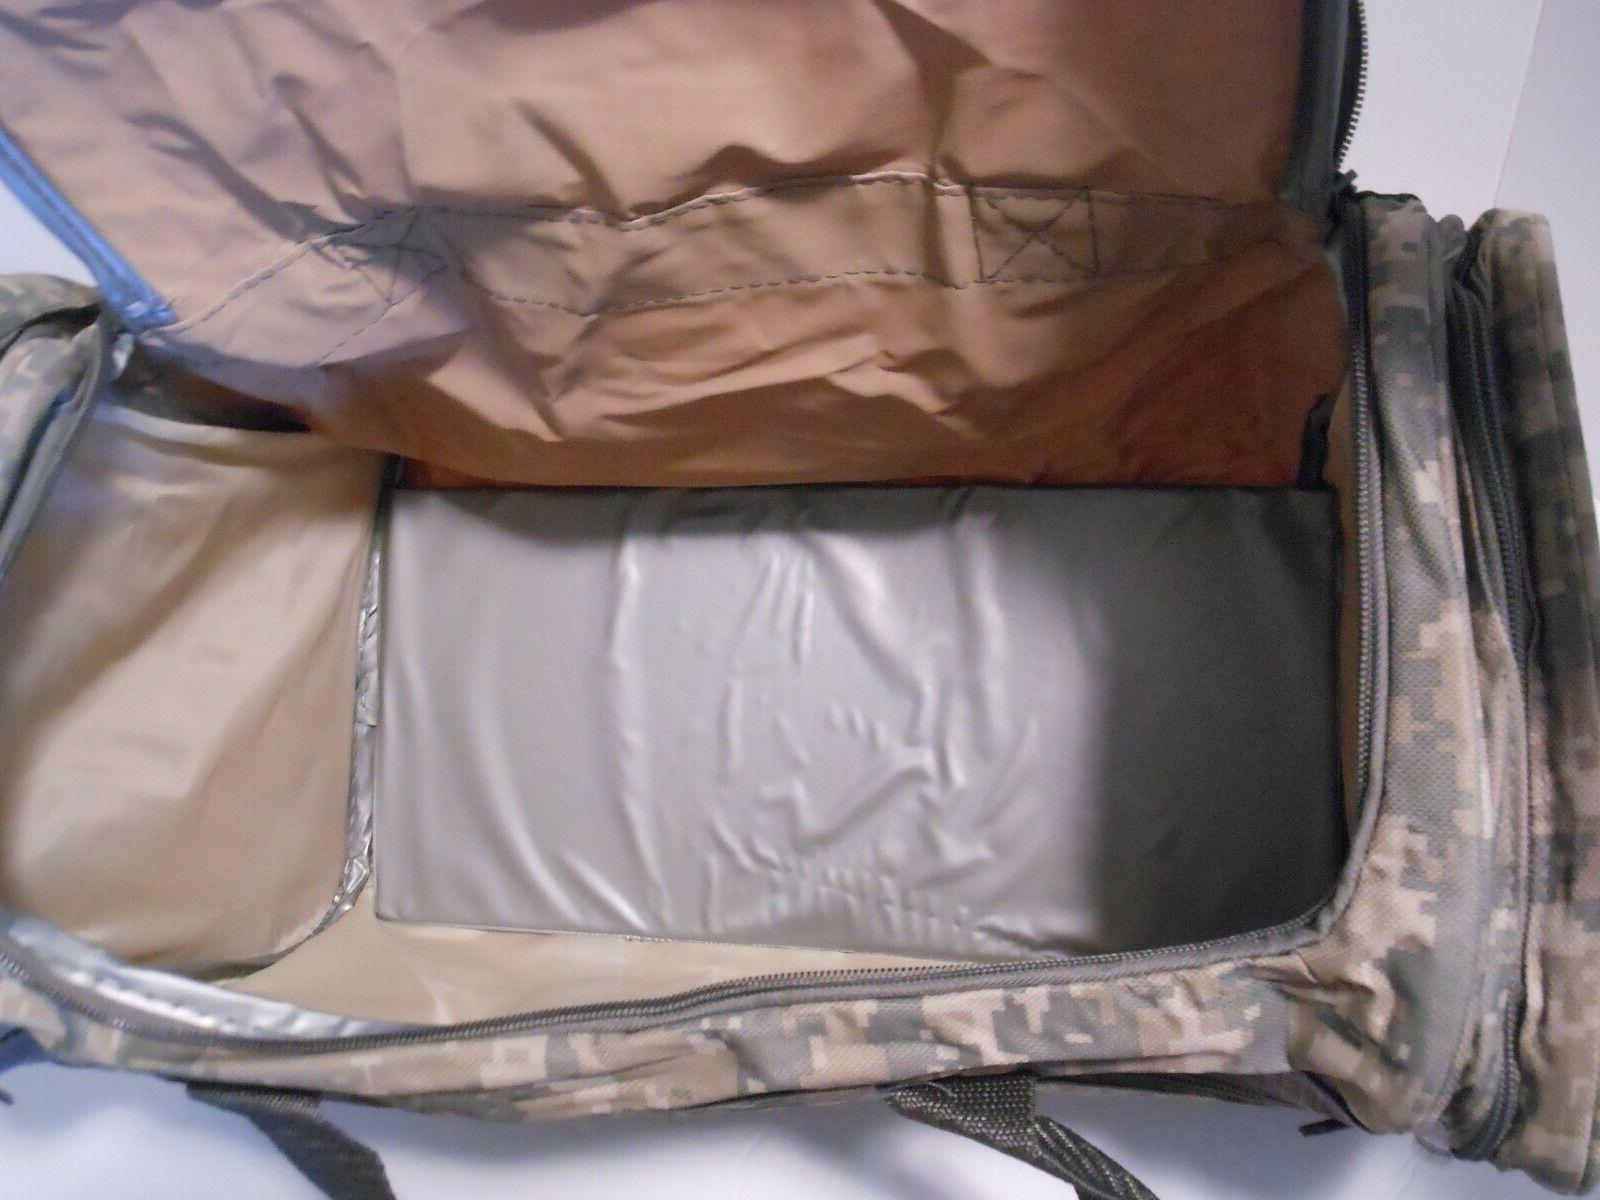 New Ammo, Travel, Bag